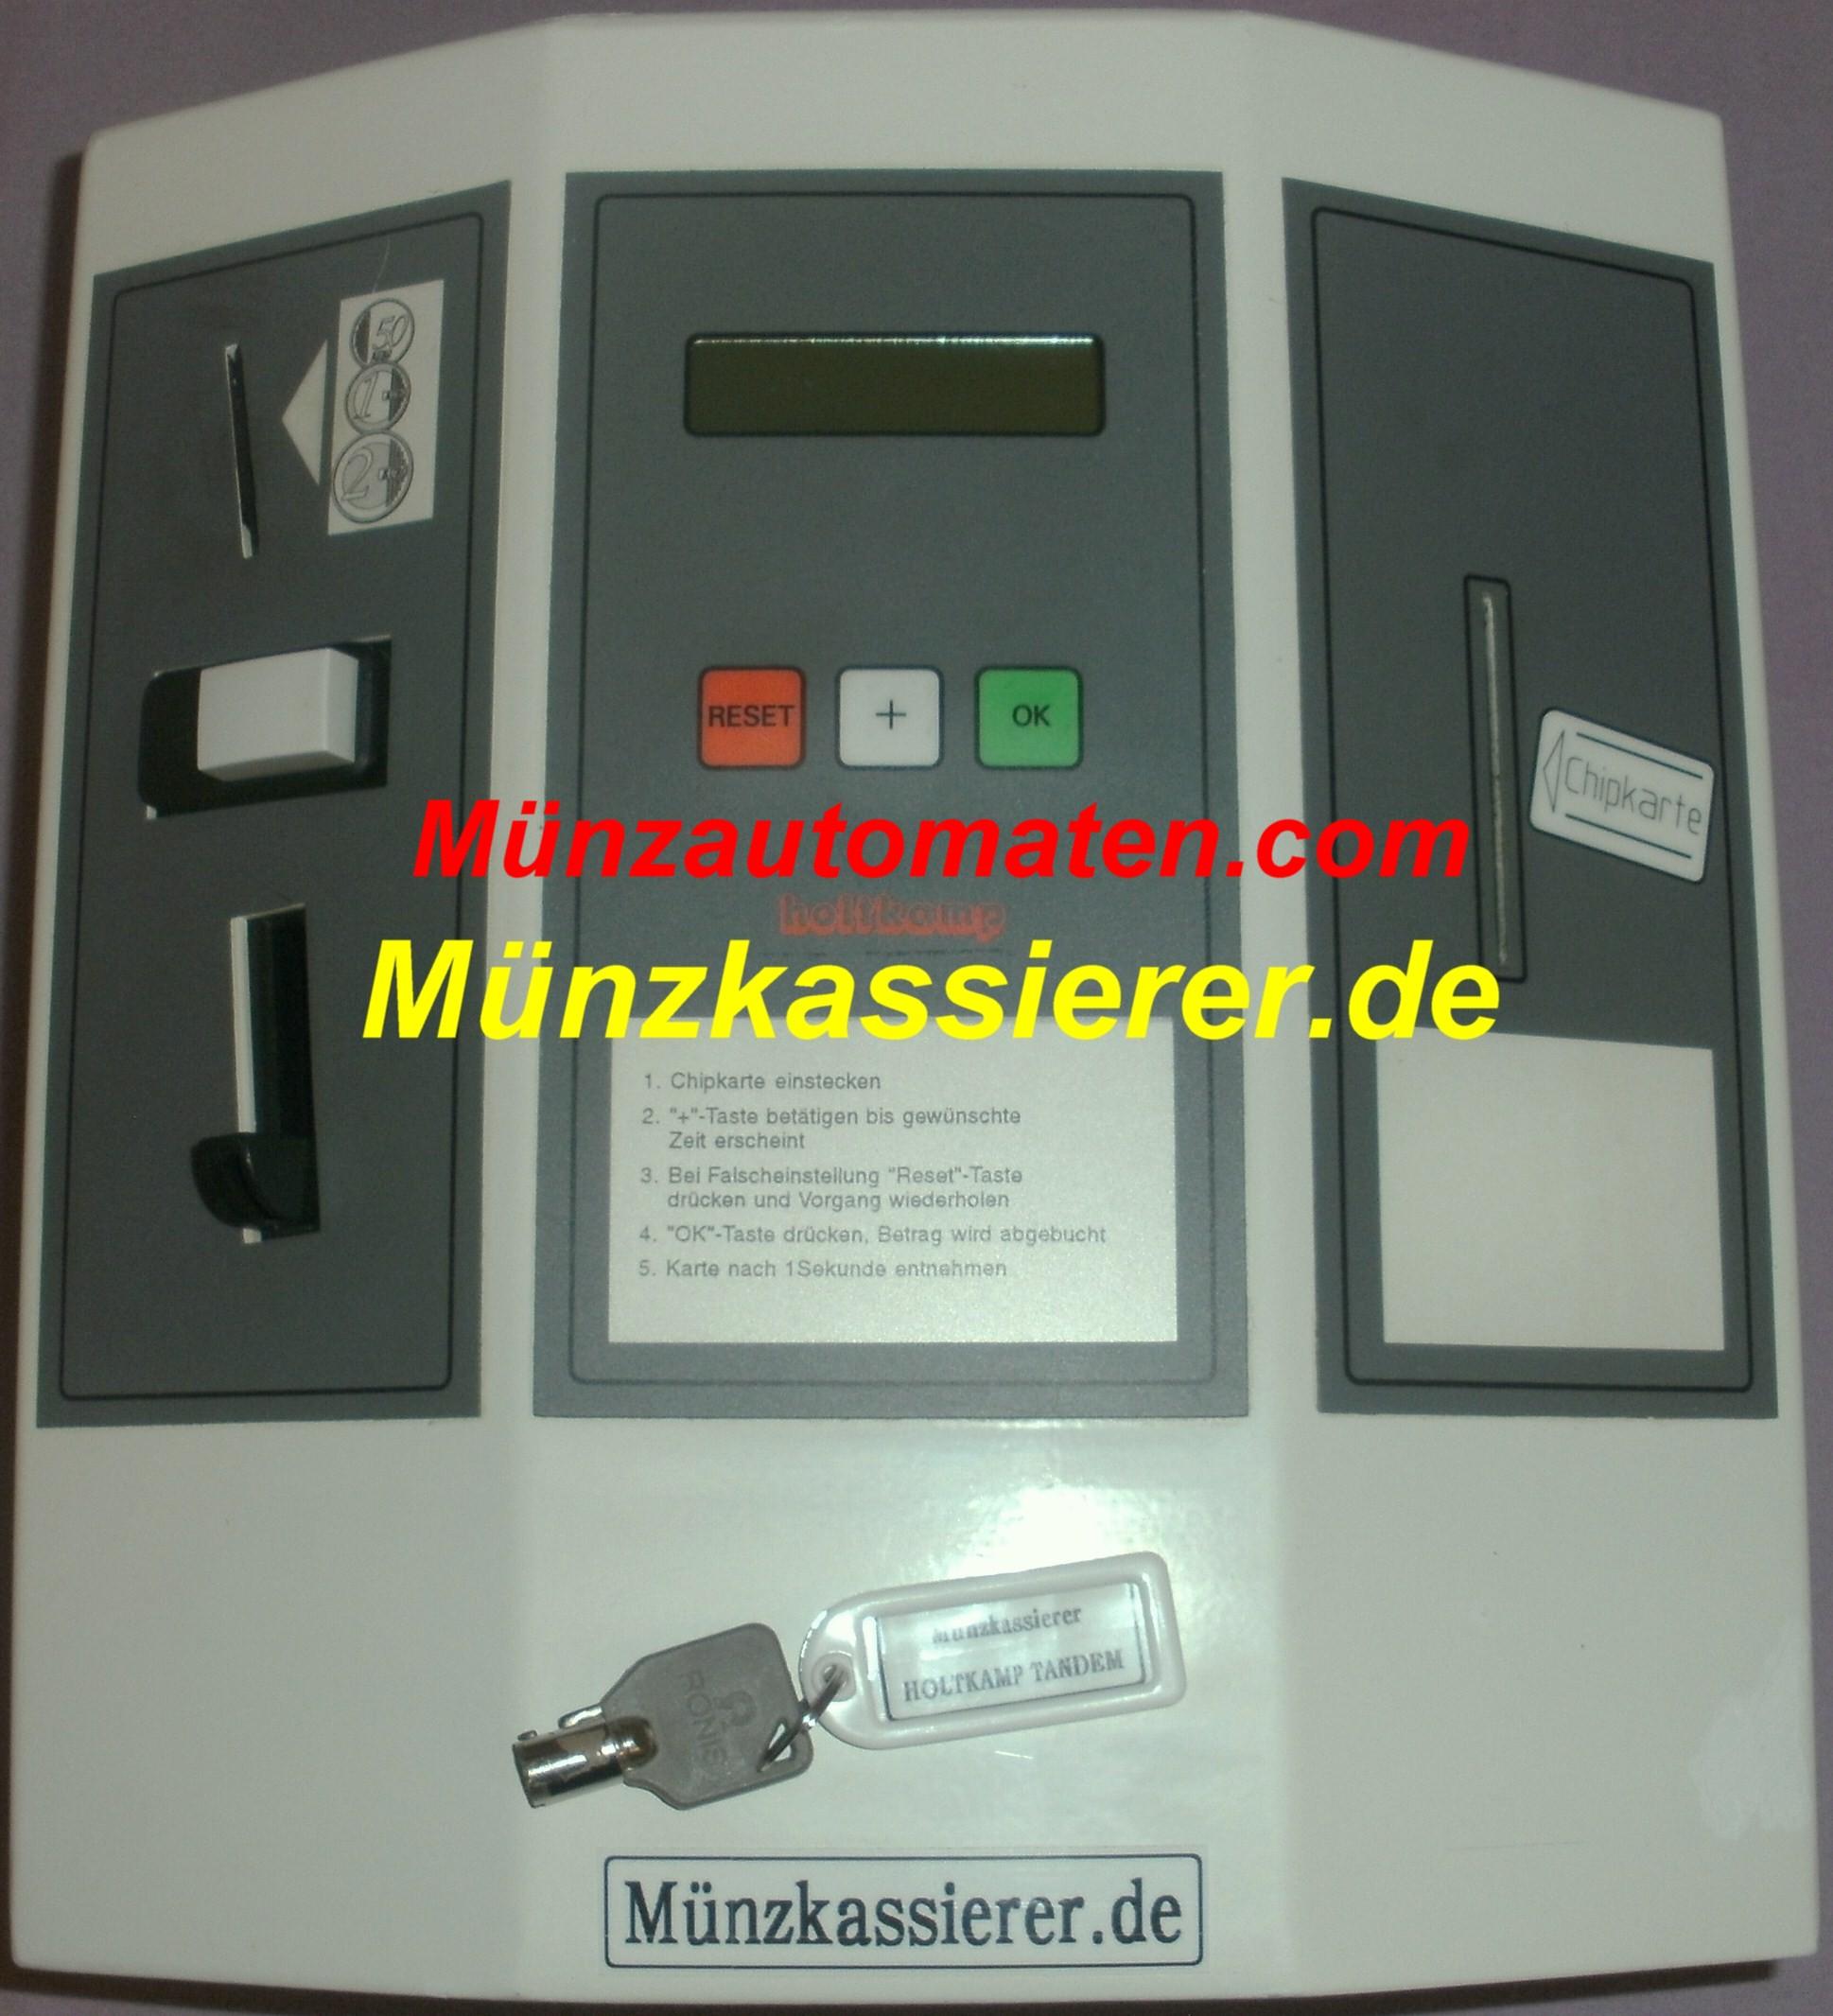 Münzkassierer.de Münzautomaten.com Münzautomat-Waschmaschine.de Waschmaschine Trockner